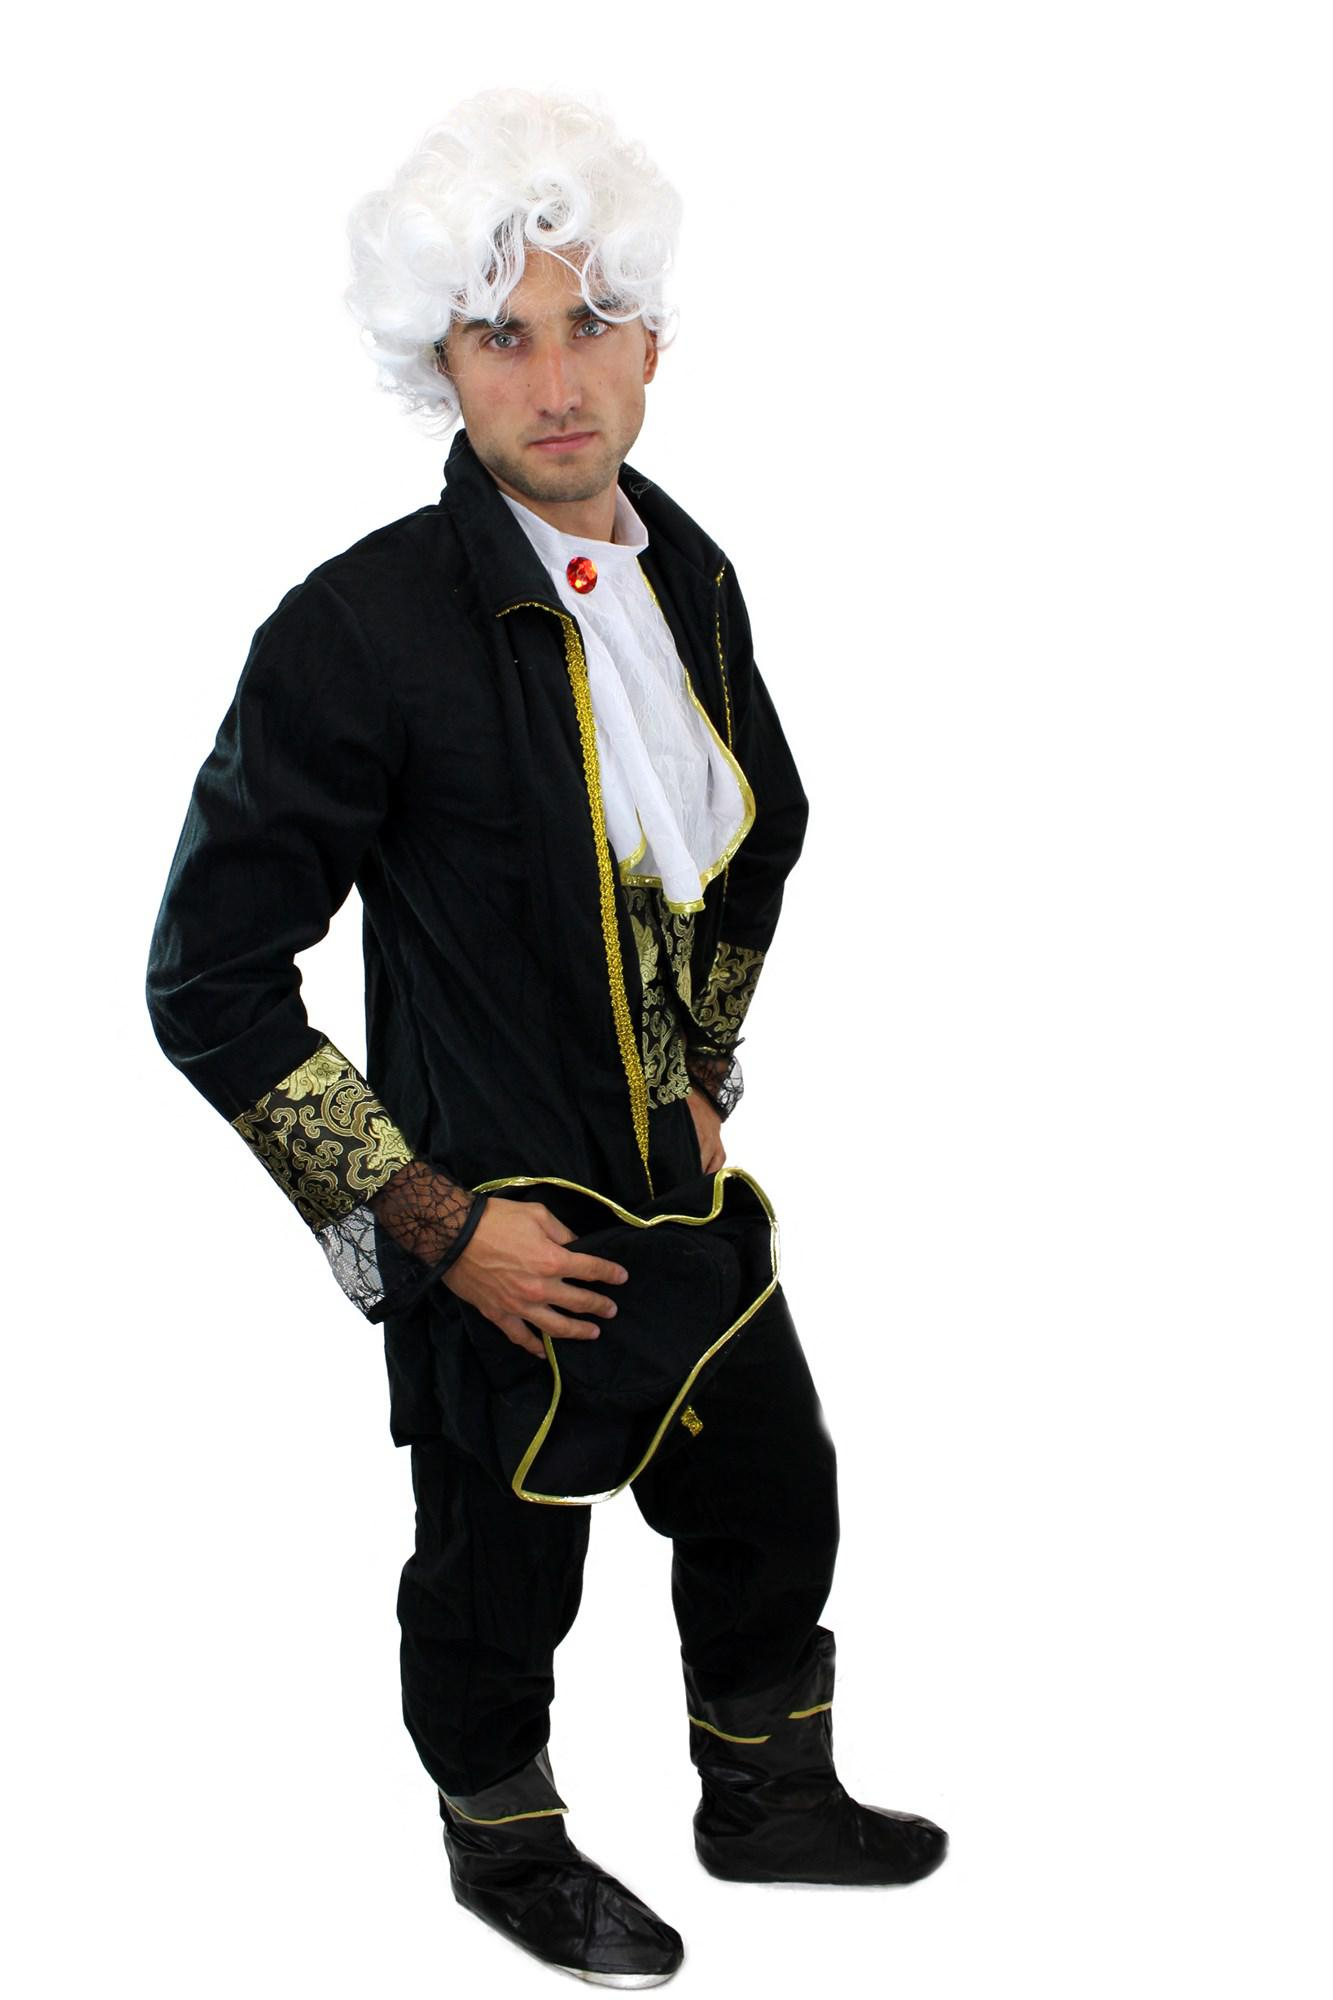 komplettset kost m herren herrenkost m barock pirat edelmann edler lord l012 kaufen bei vk. Black Bedroom Furniture Sets. Home Design Ideas